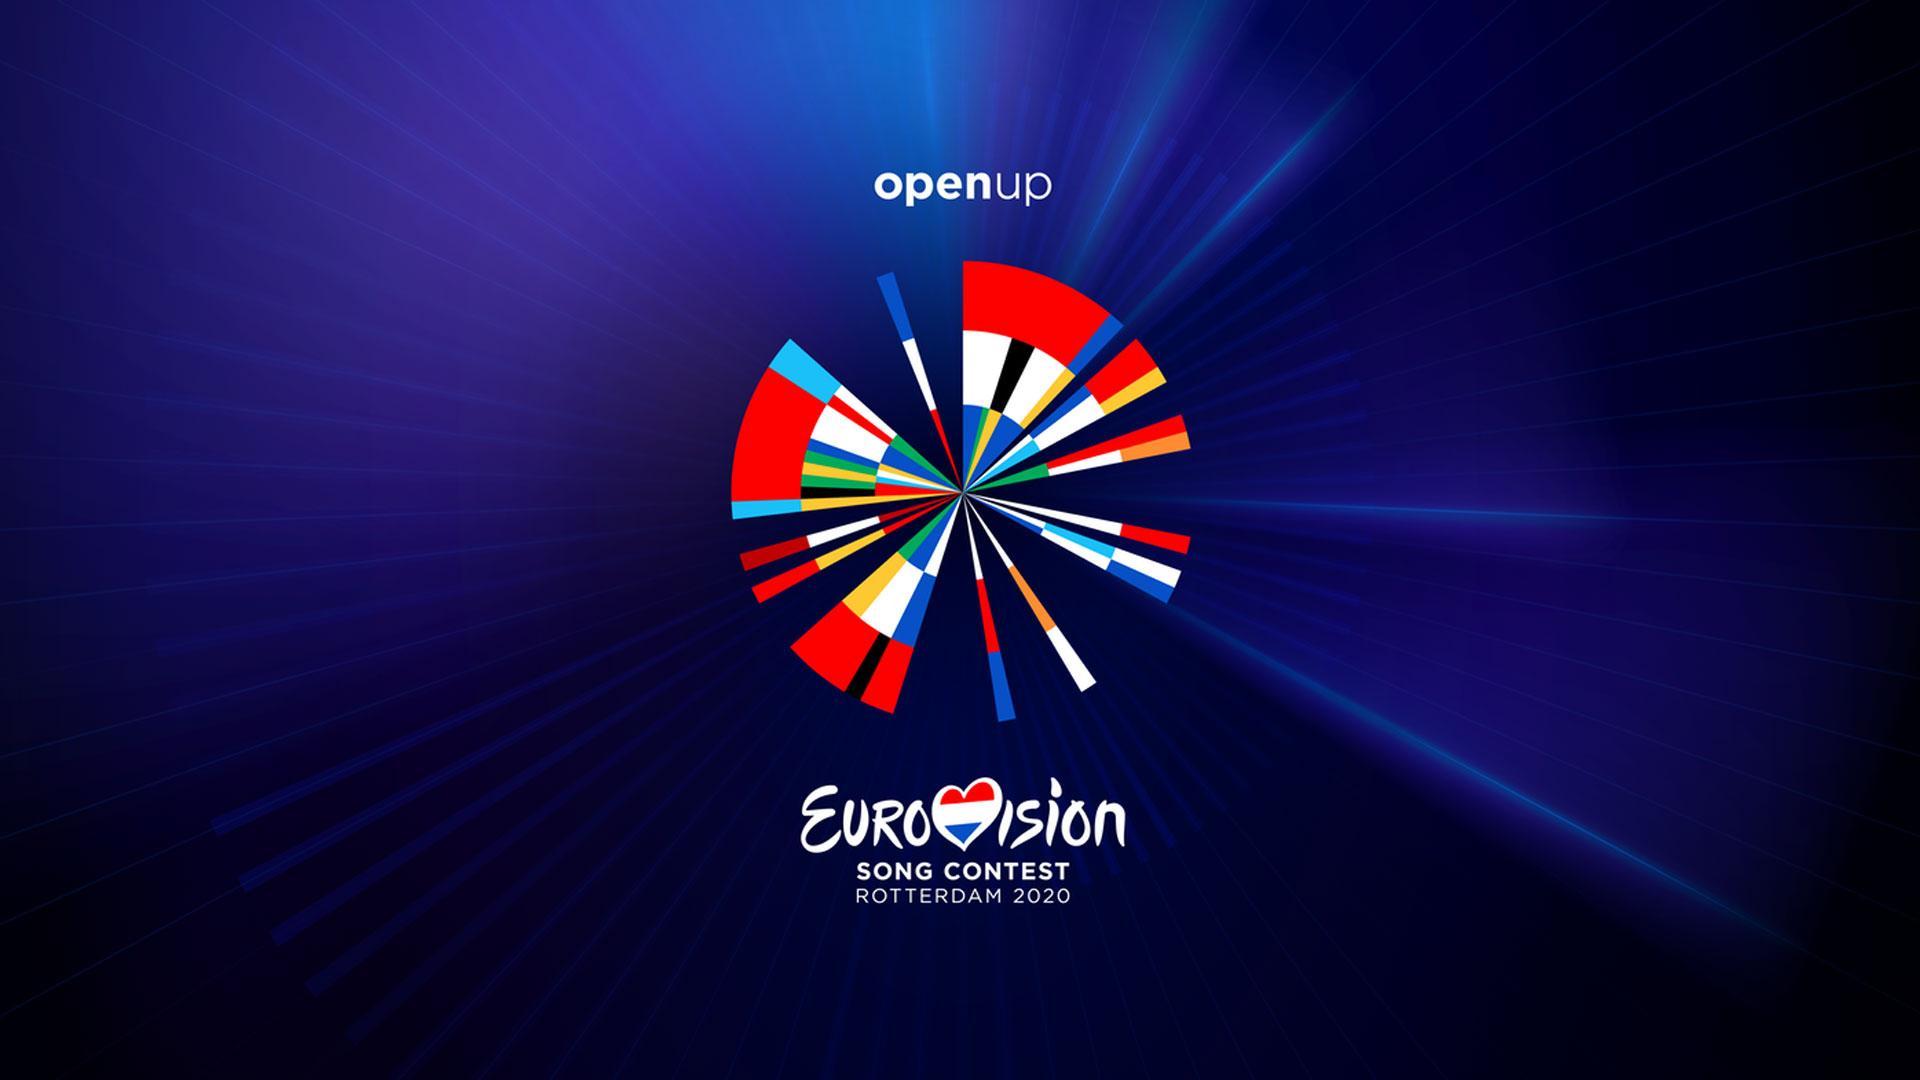 Eneco Nationaal Partner Eurovisie Songfestival 2020